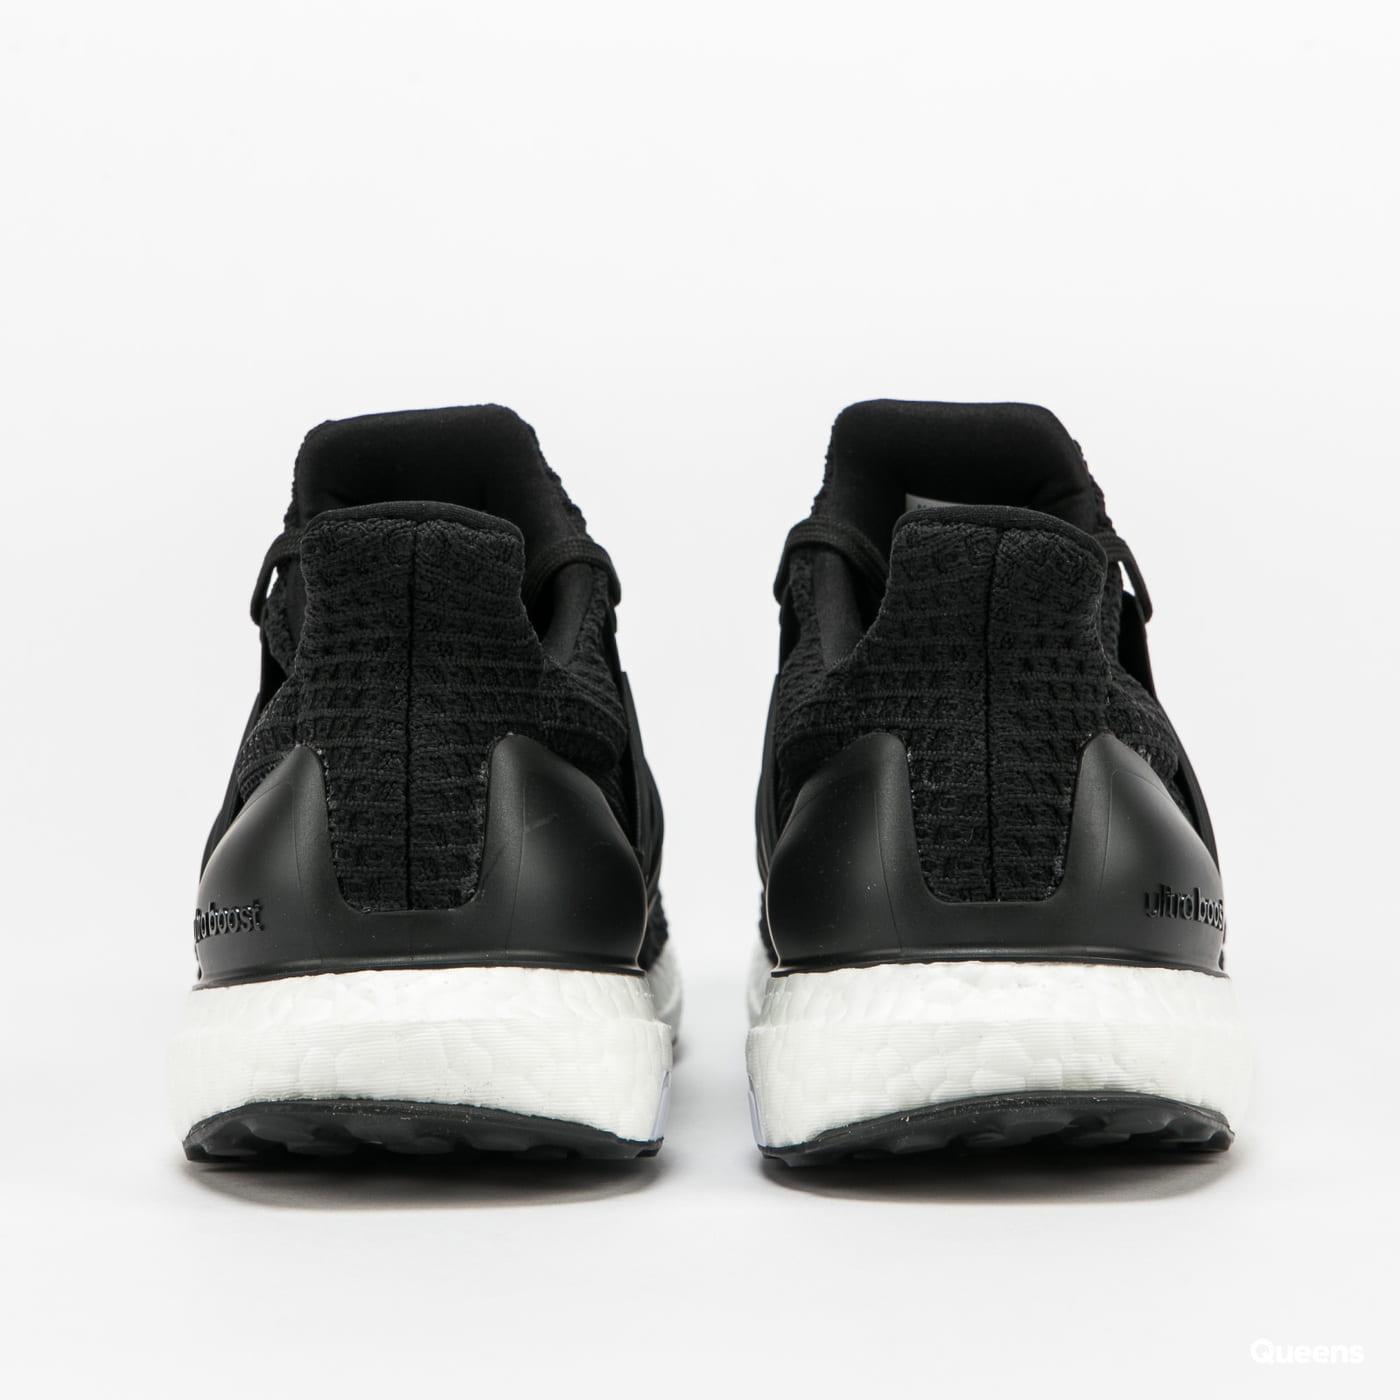 adidas Performance Ultraboost 4.0 DNA cblack / cblack / solar red